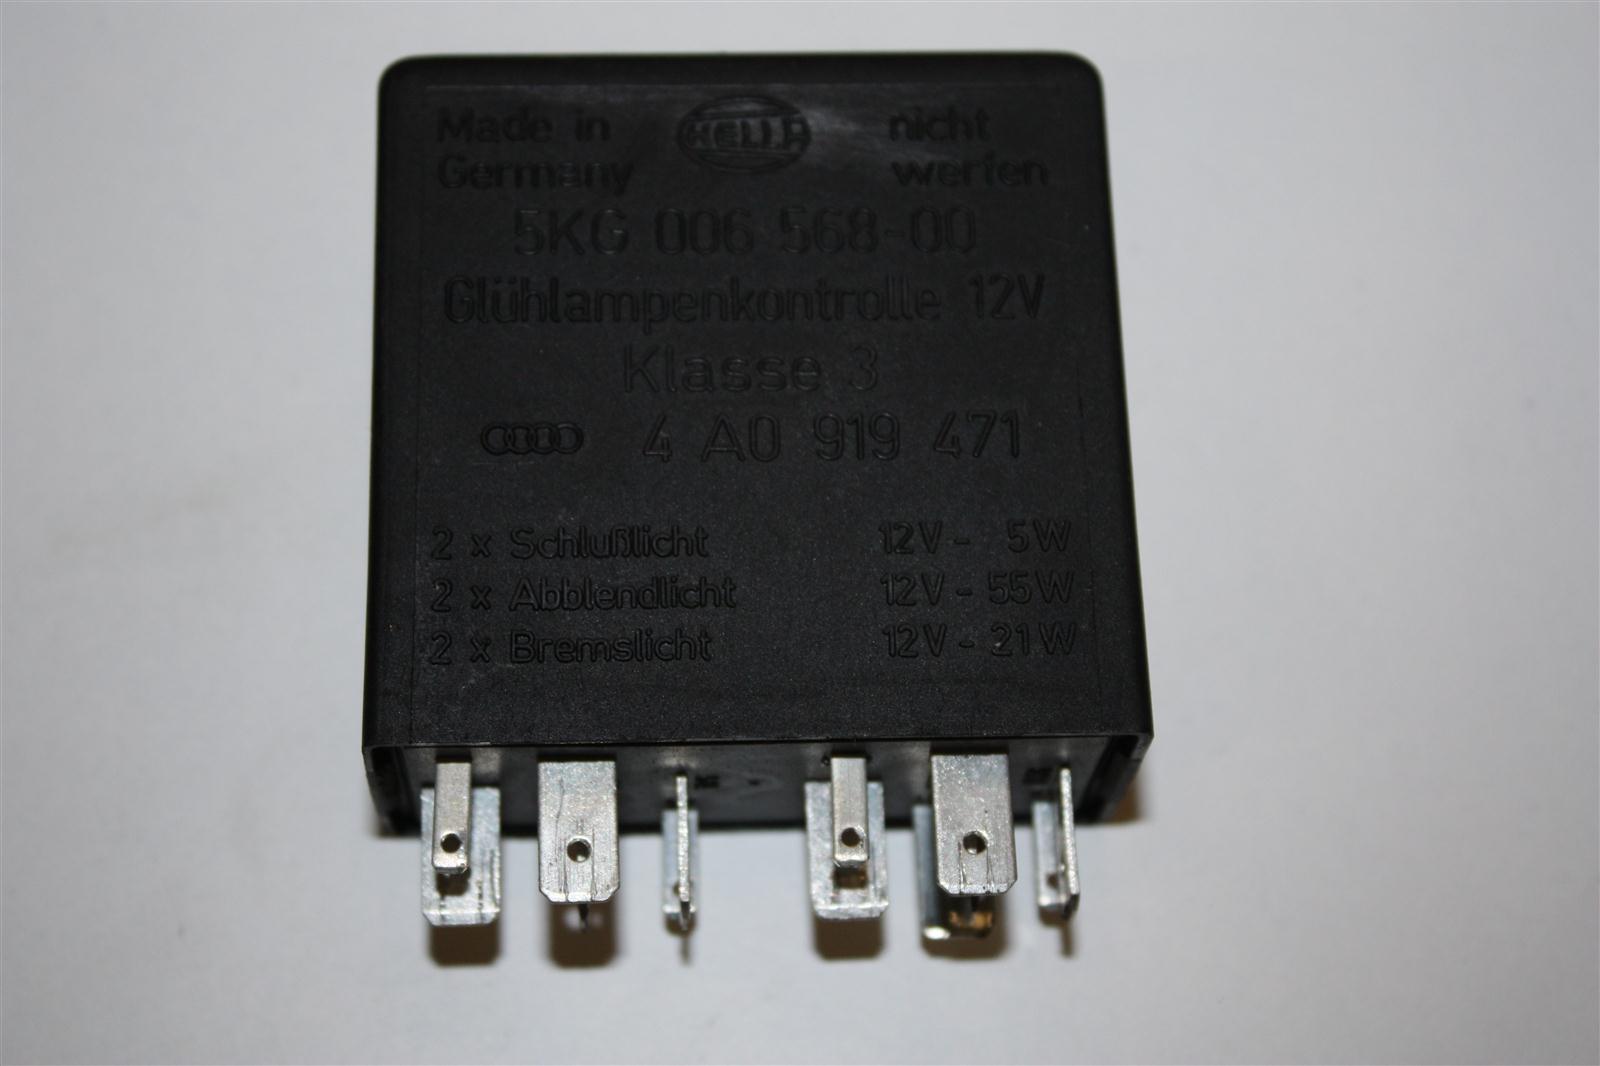 Audi/VW 100/A6 C4 Relais 301 Lampenkontrollgerät 4A0919471